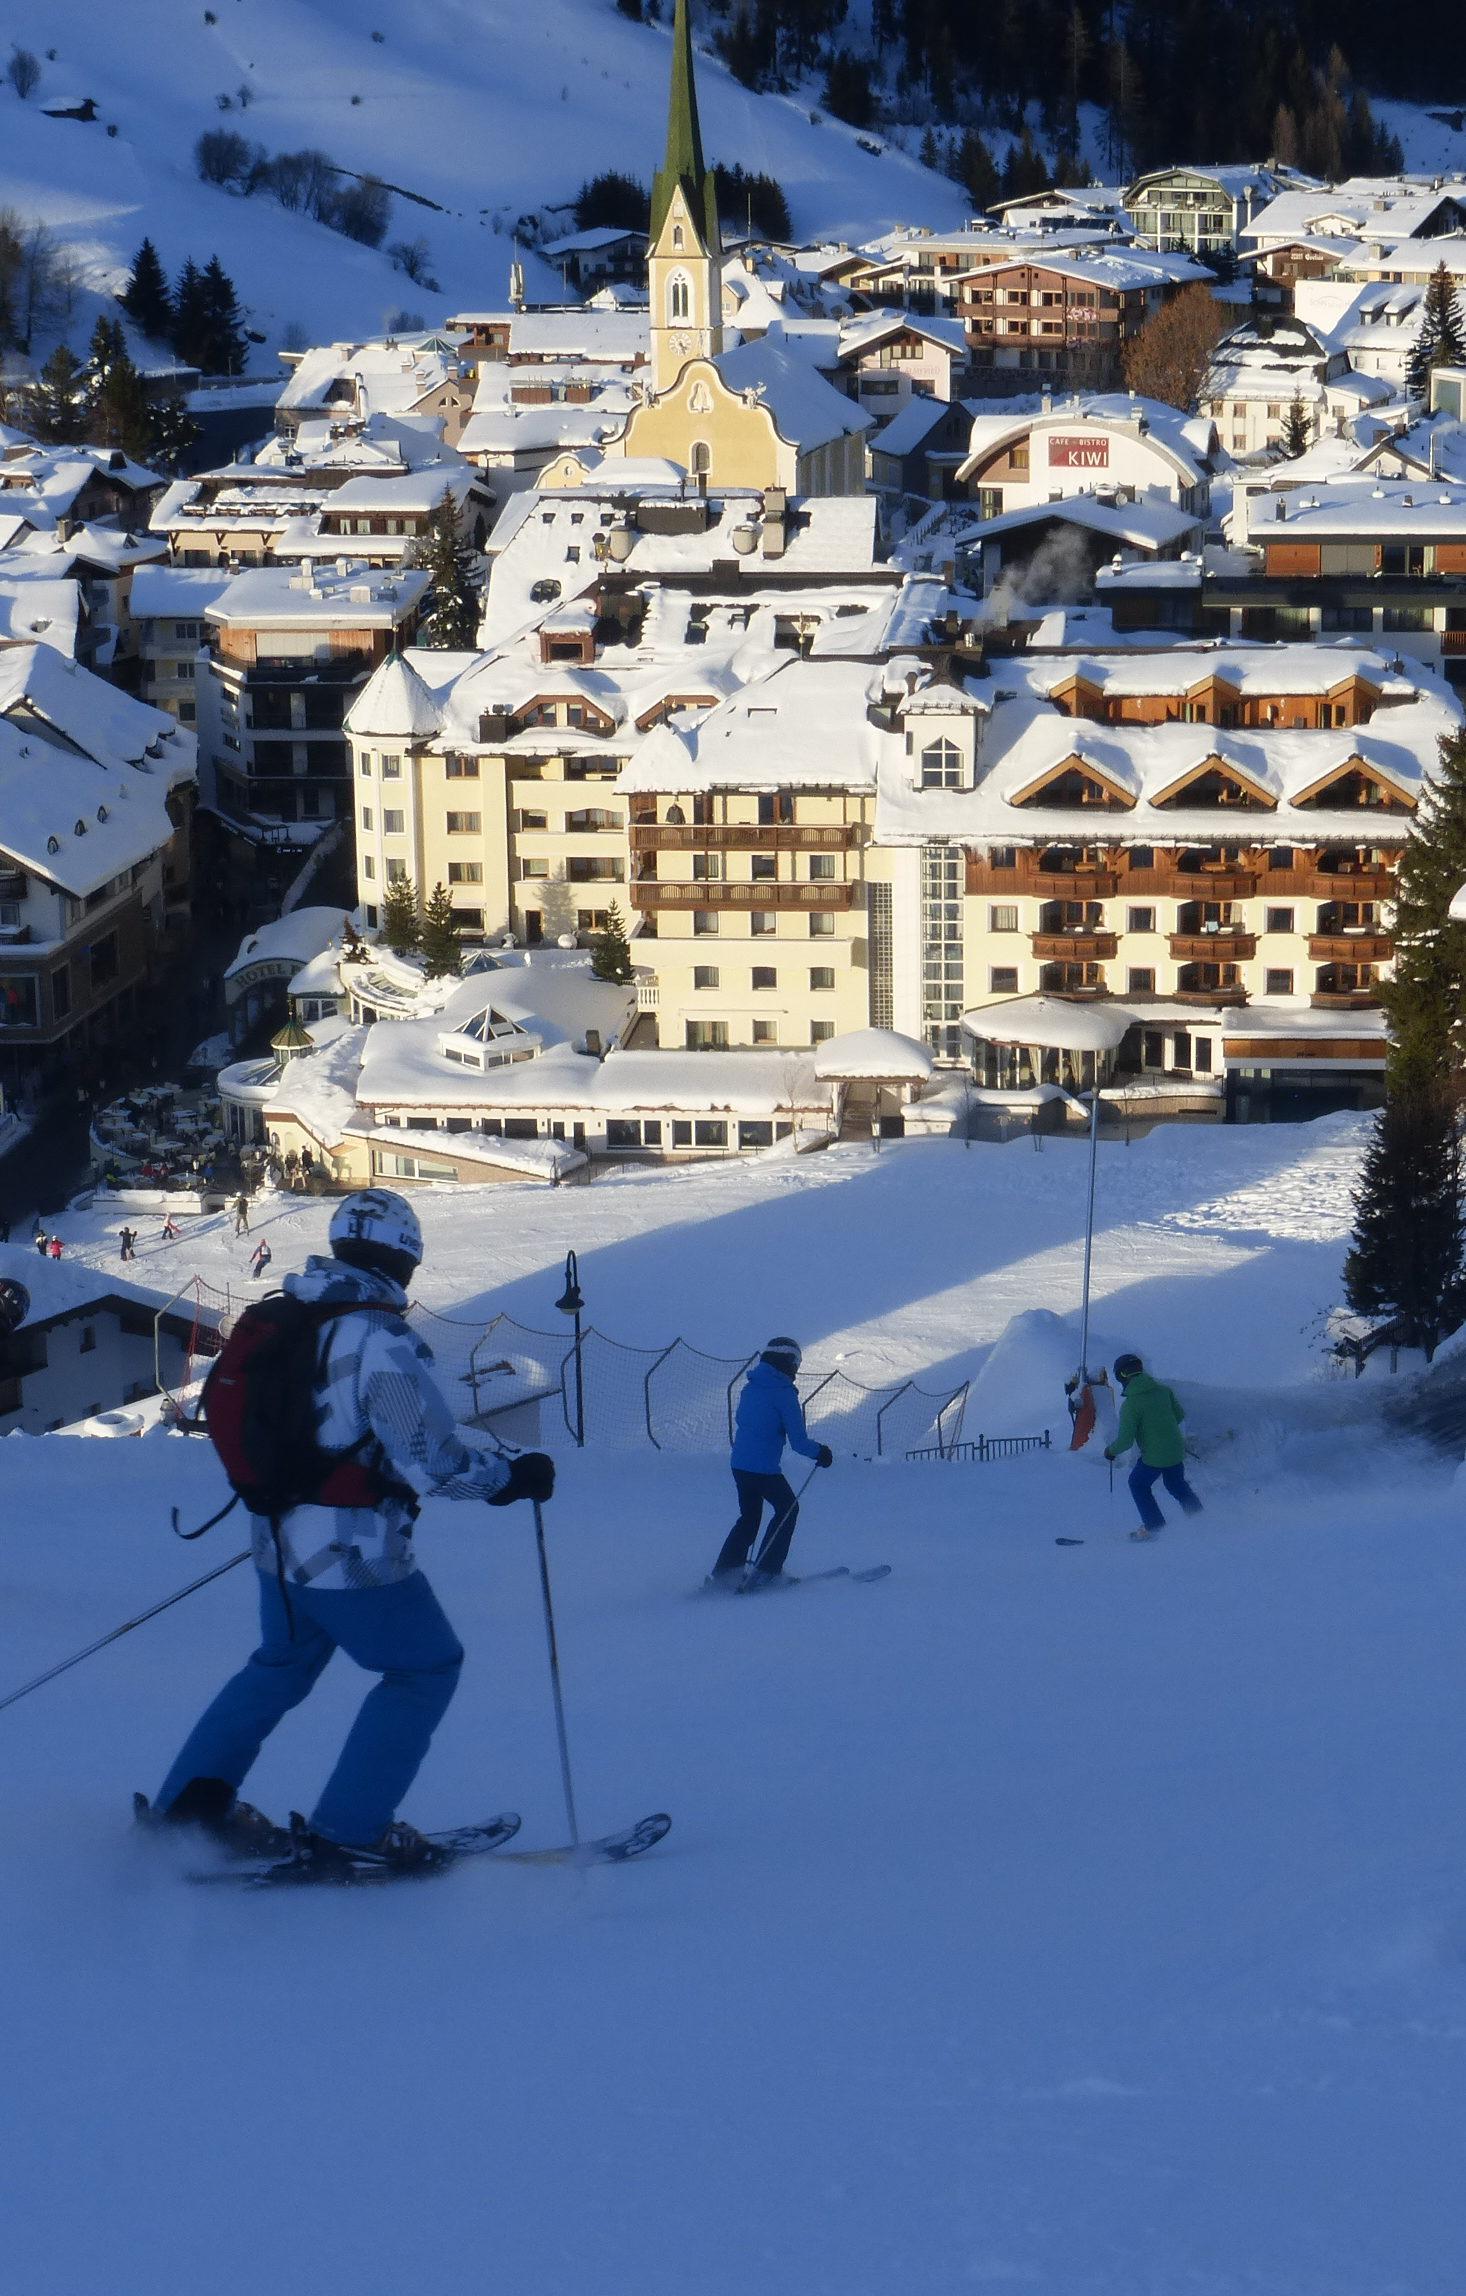 L'autriche en ski